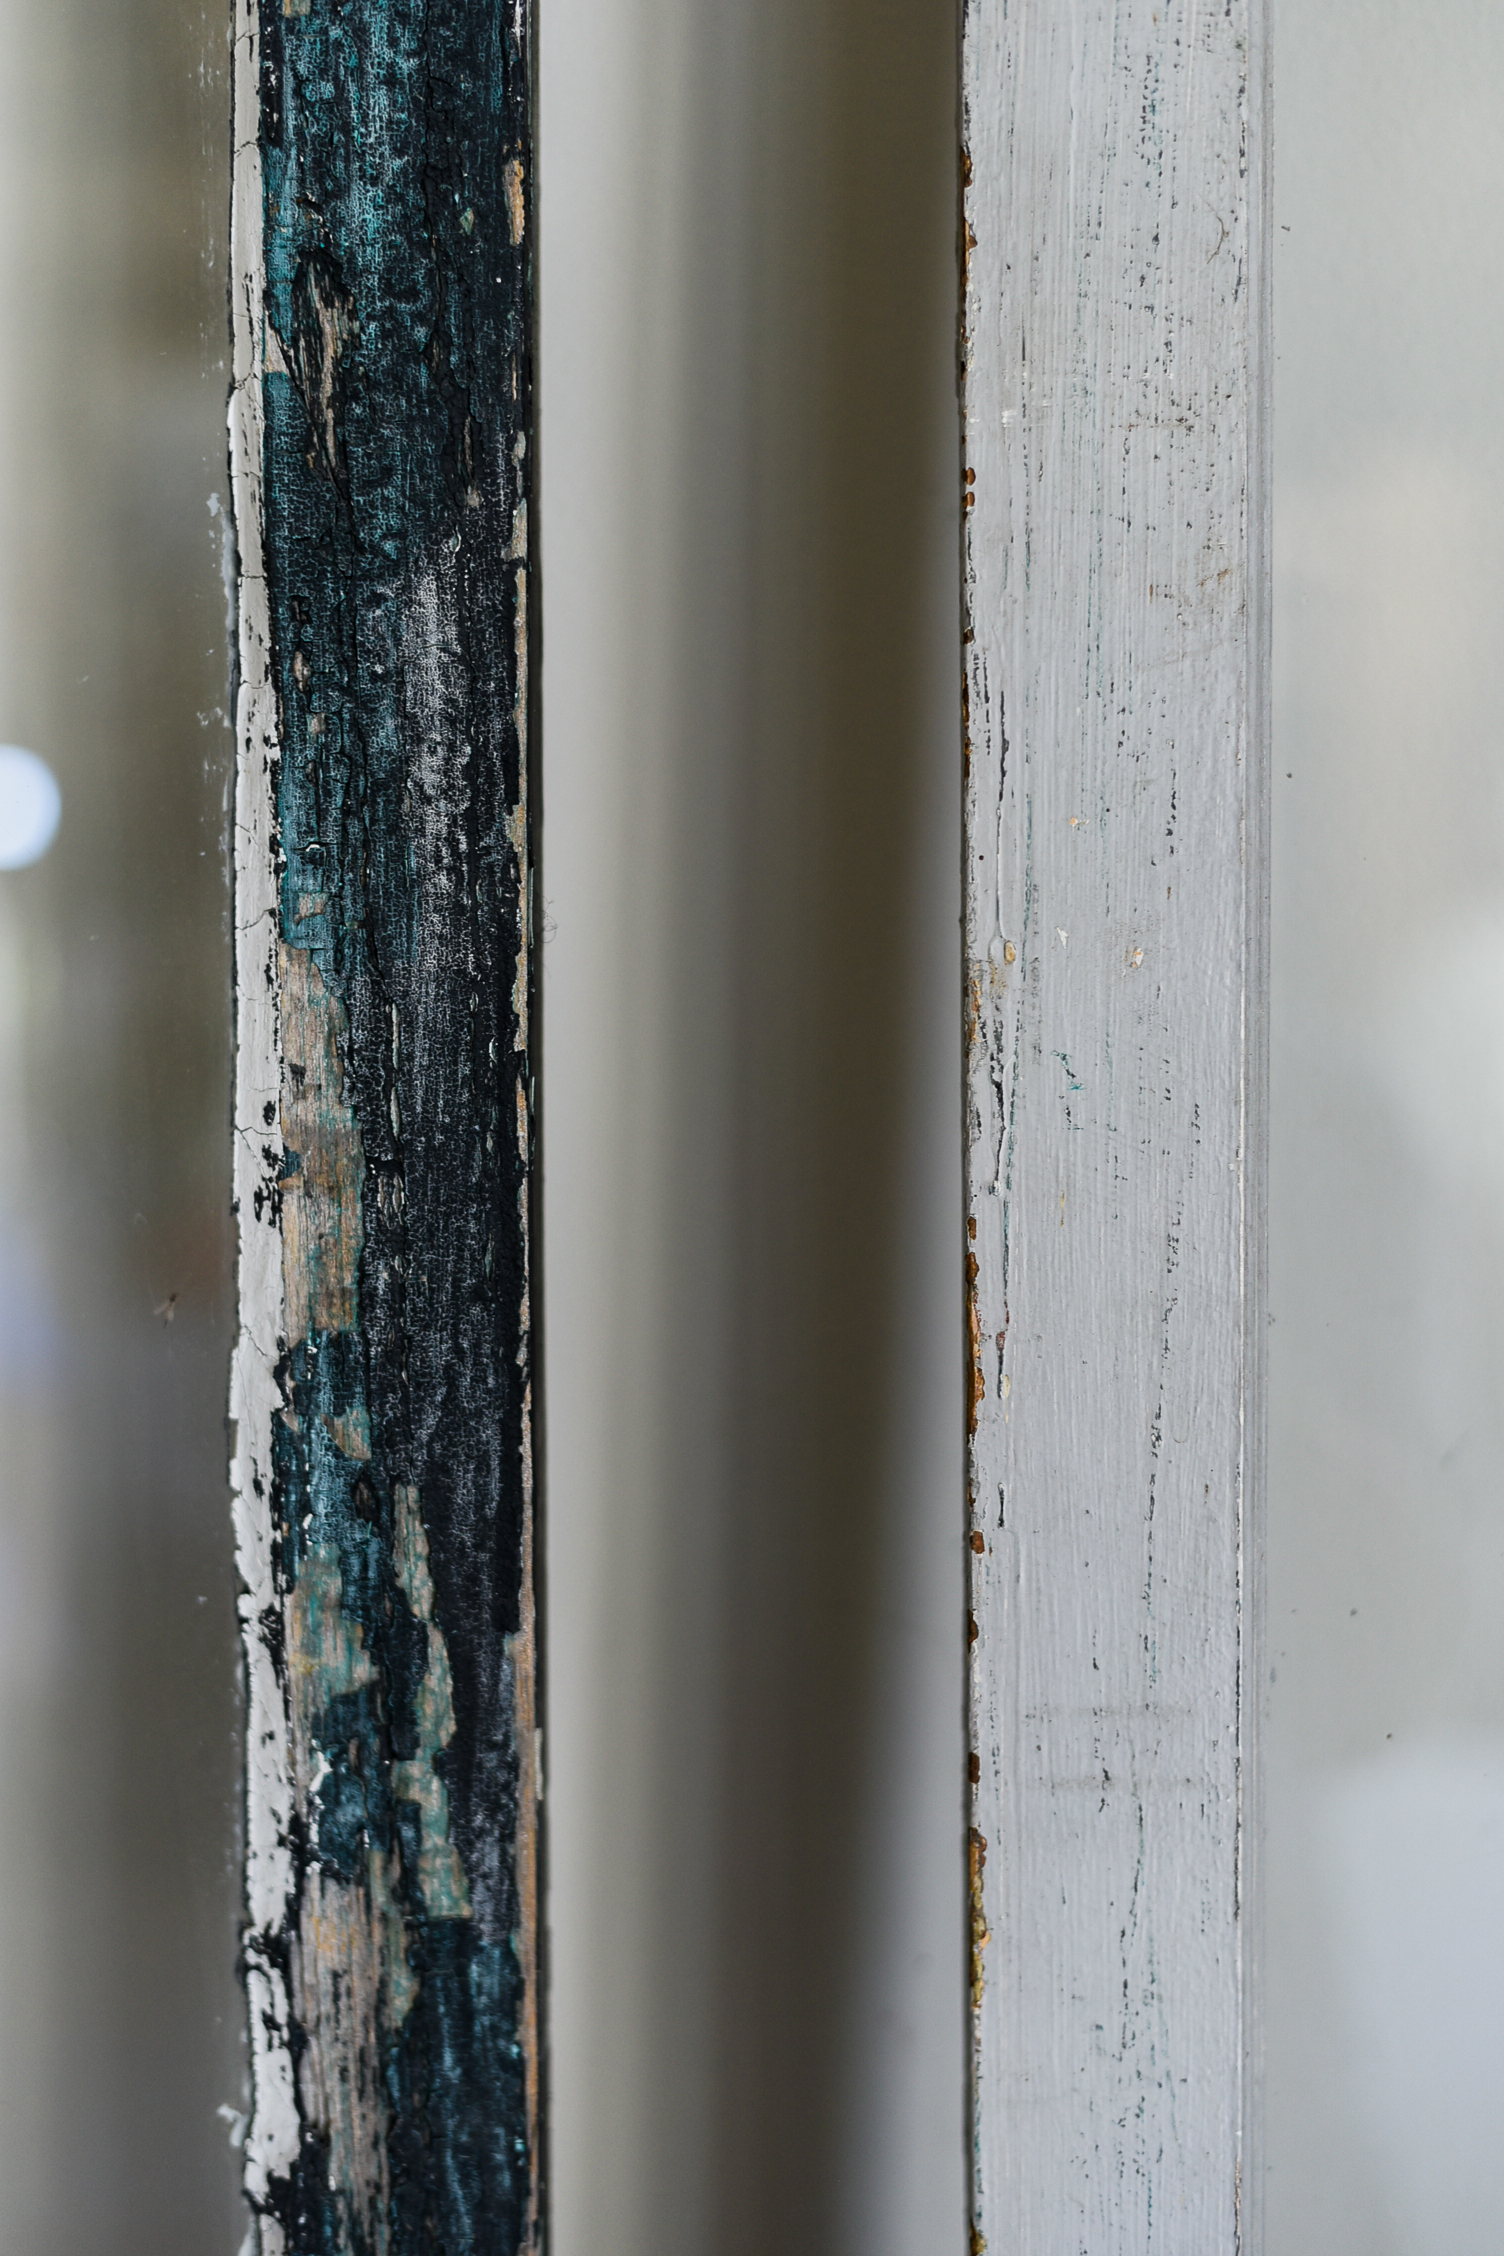 SALVAGED FRENCH WINDOWS